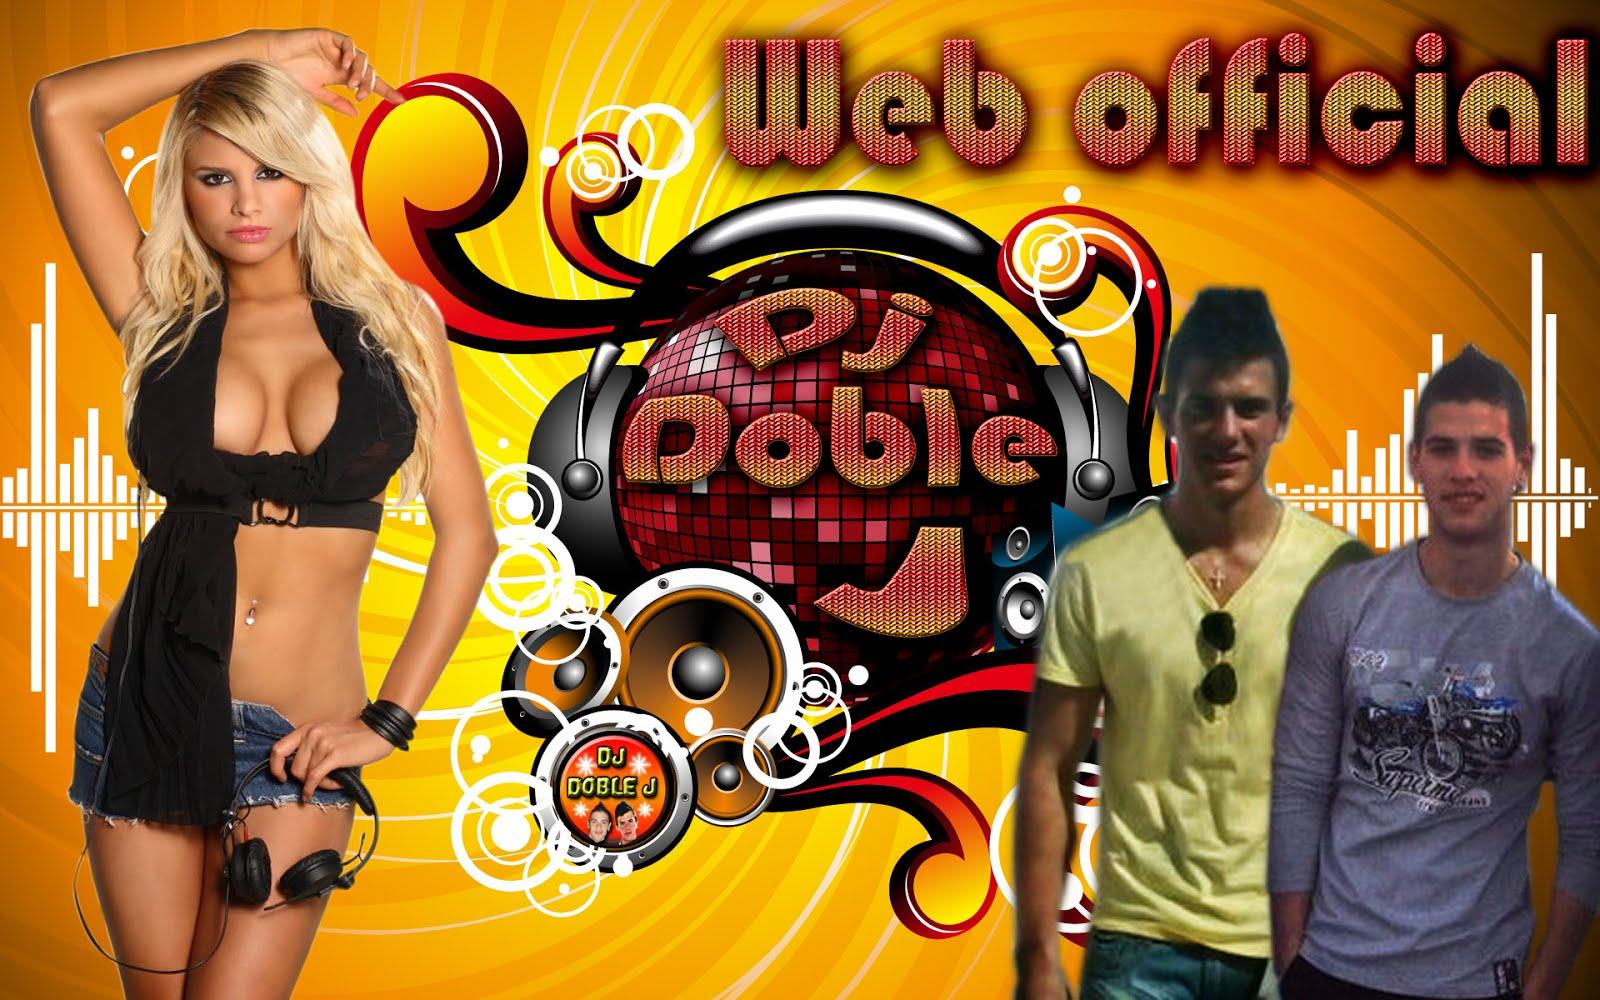 Web Oficial - Dj Doble J